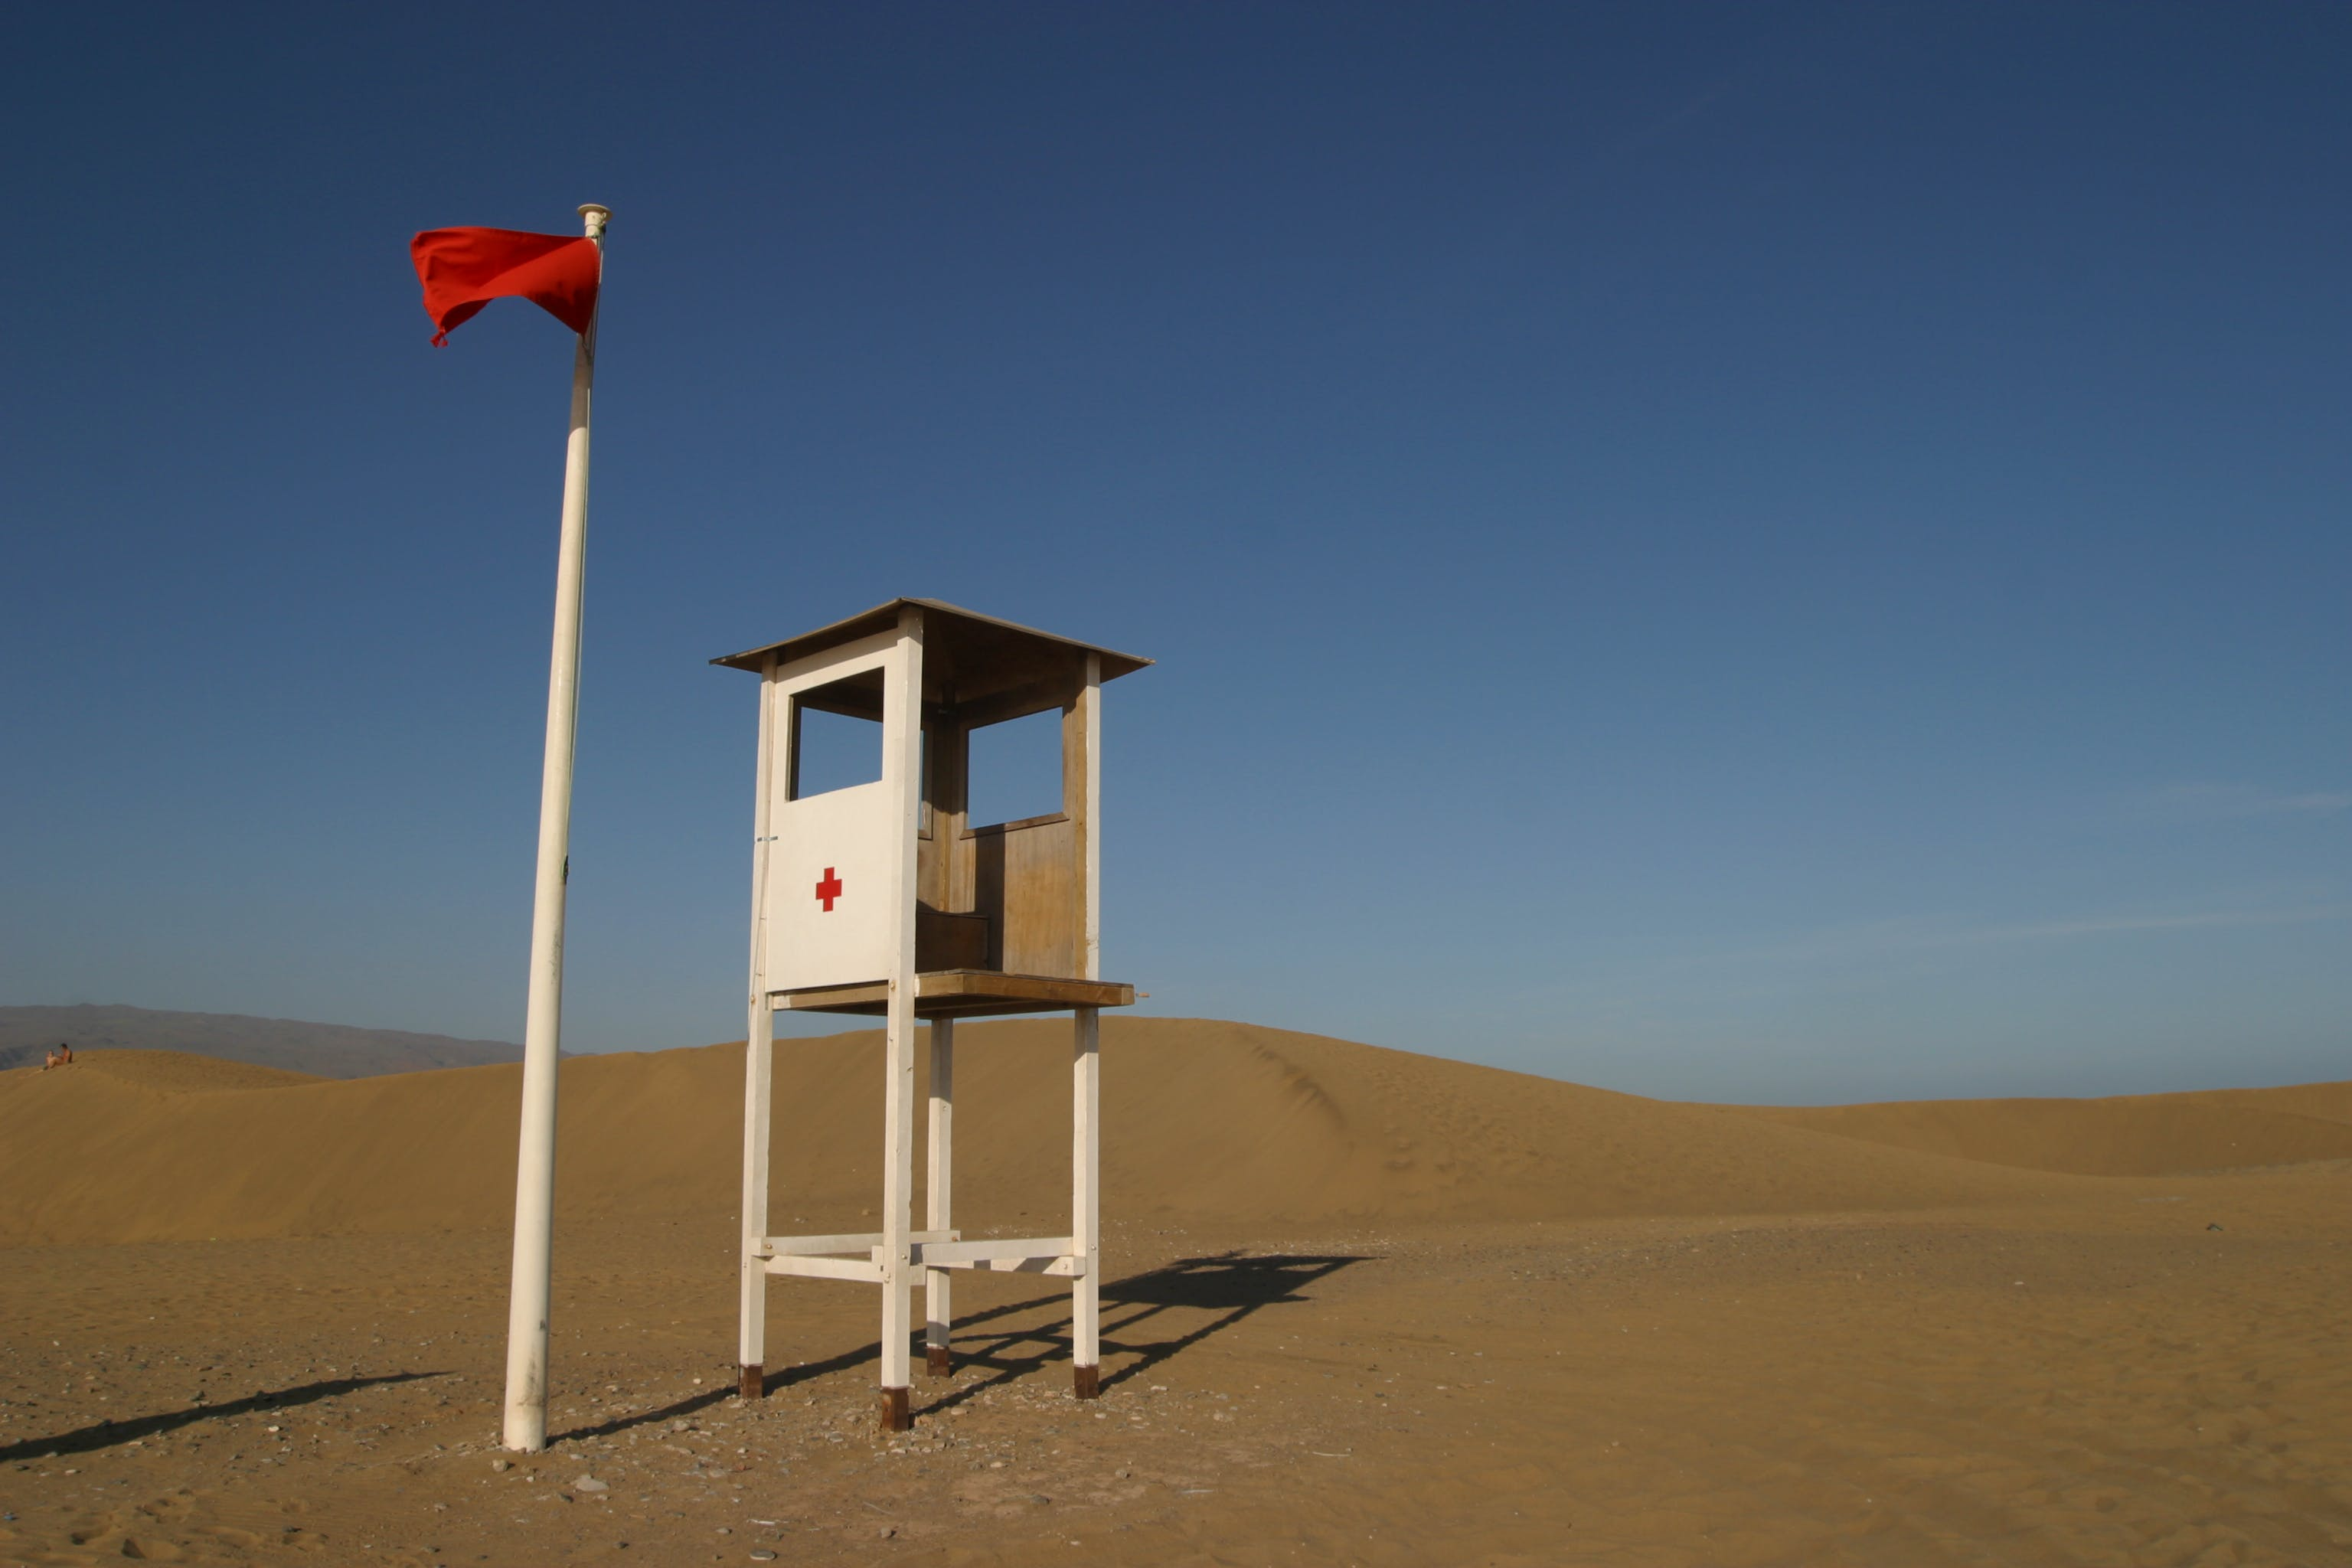 White Lifeguard House on Sand